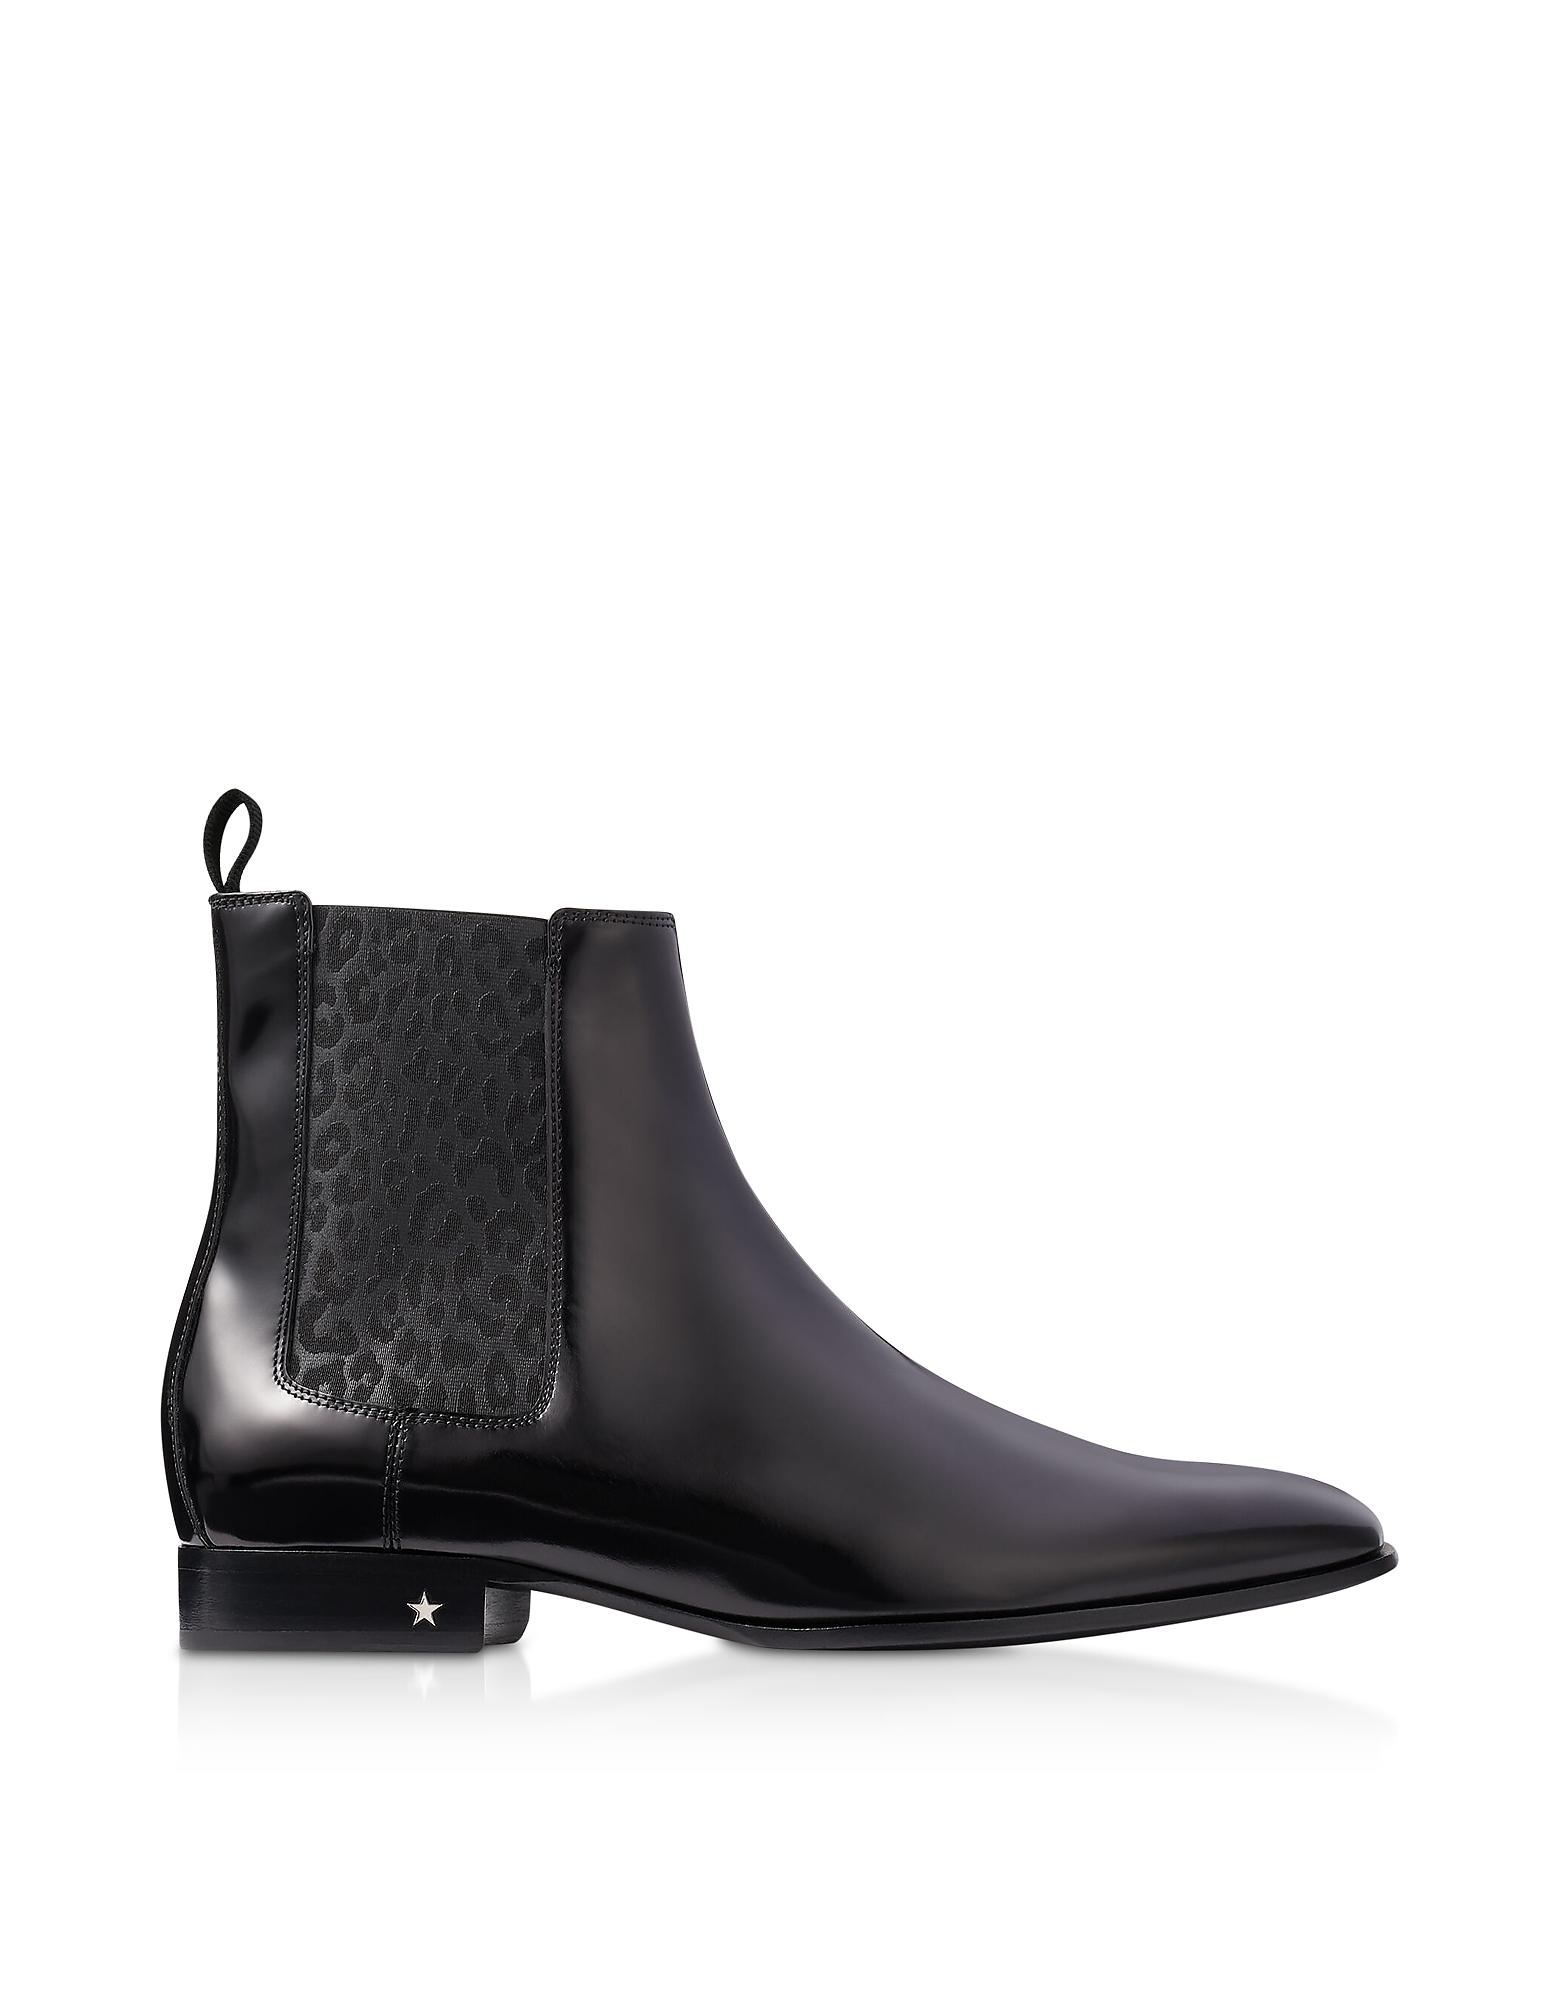 Jimmy Choo Black XCL Sawyer Boots